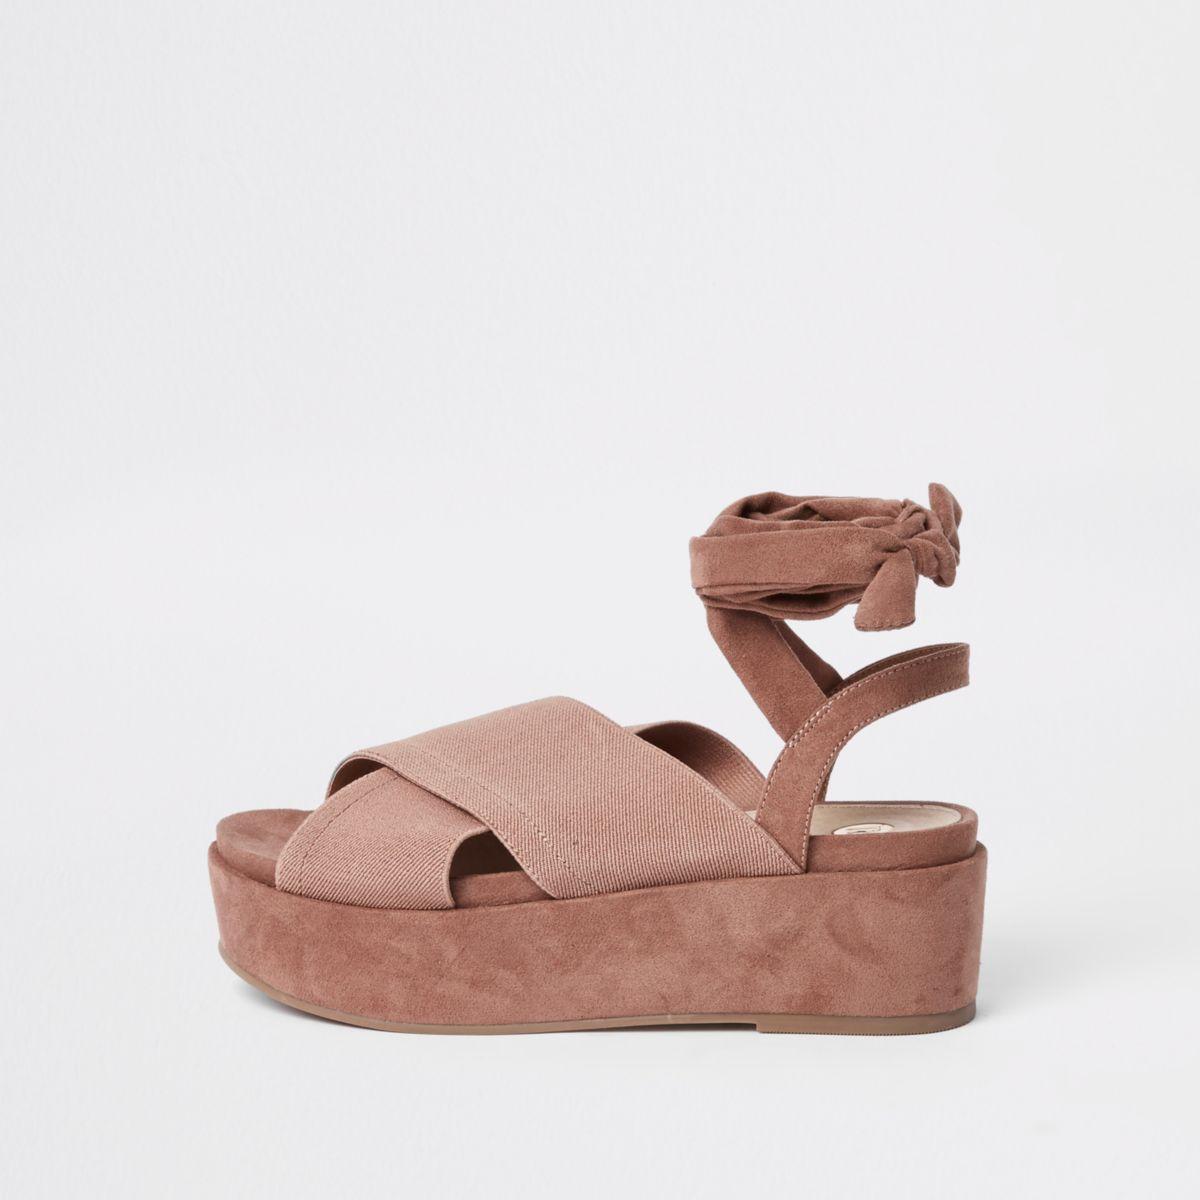 Nude cross strap platform sandals